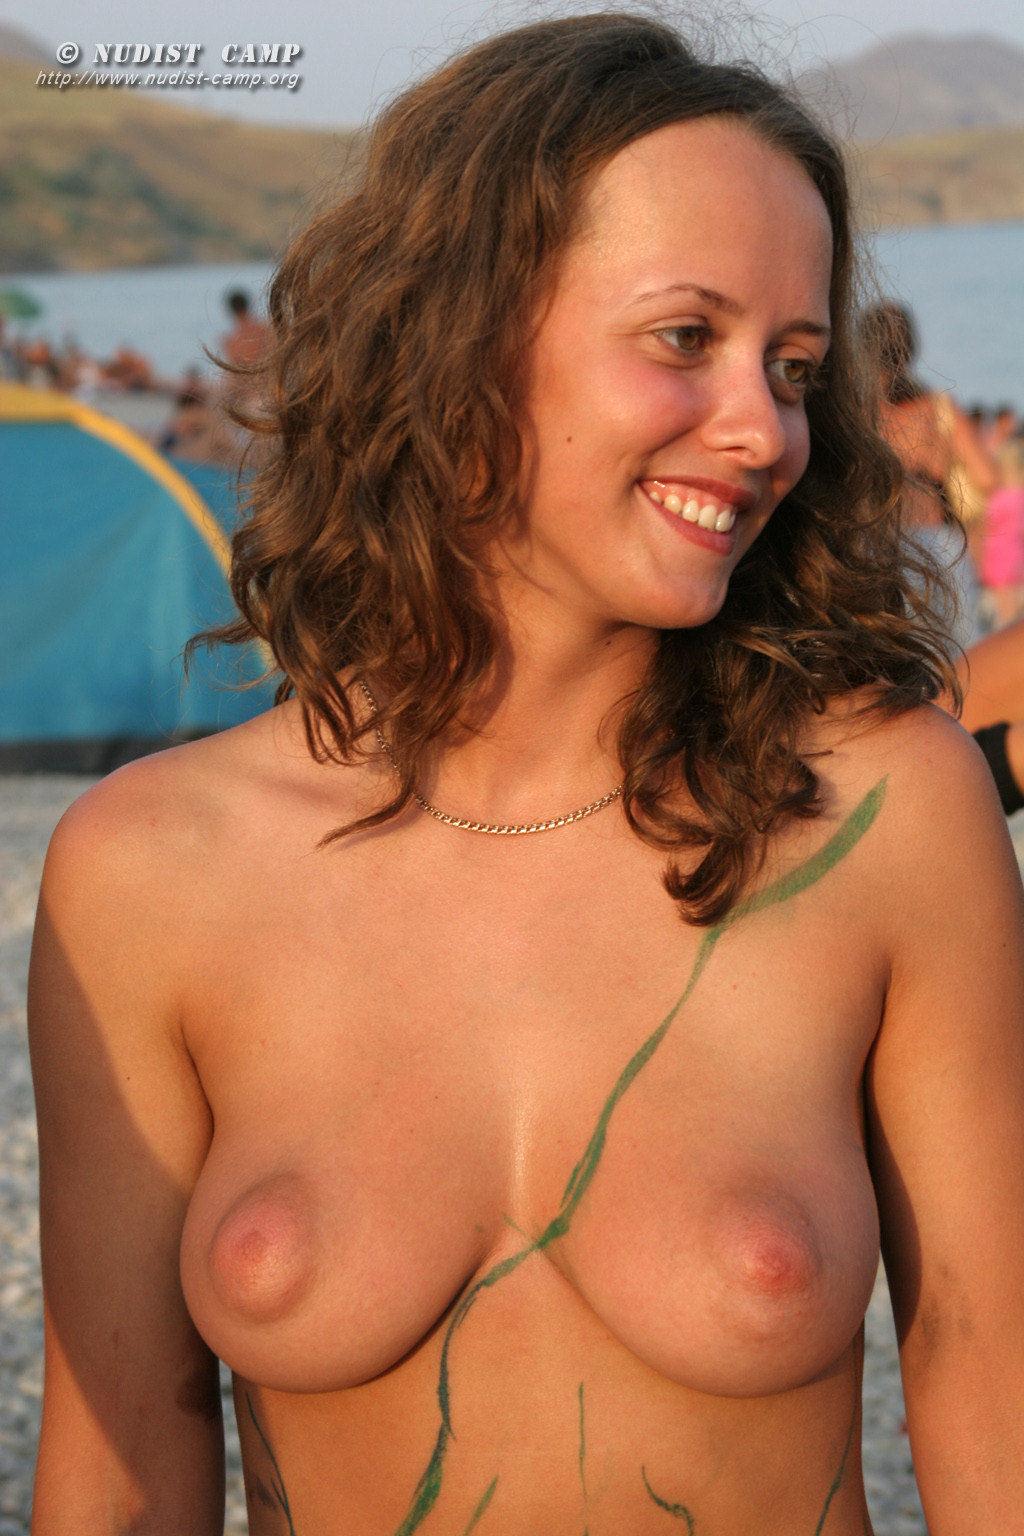 Advise Vista nudist camp sorry, that